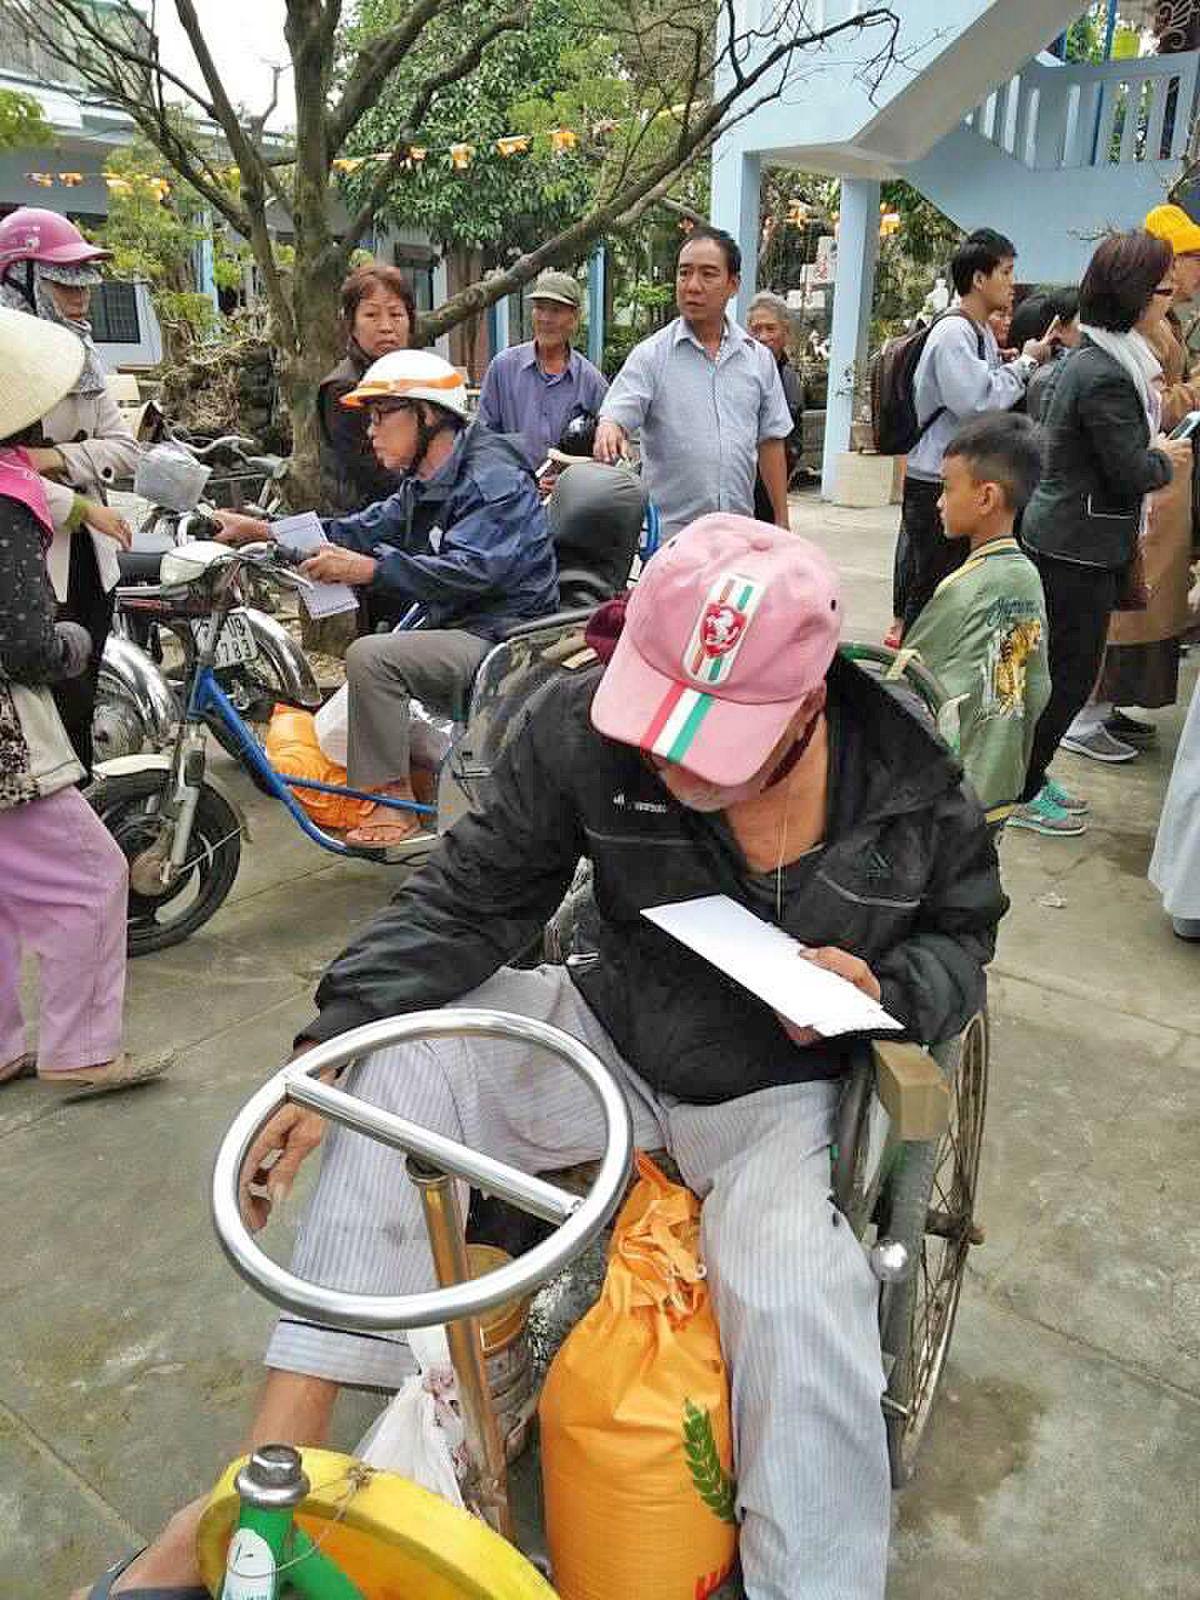 tang qua Quang ngai 2 (05)